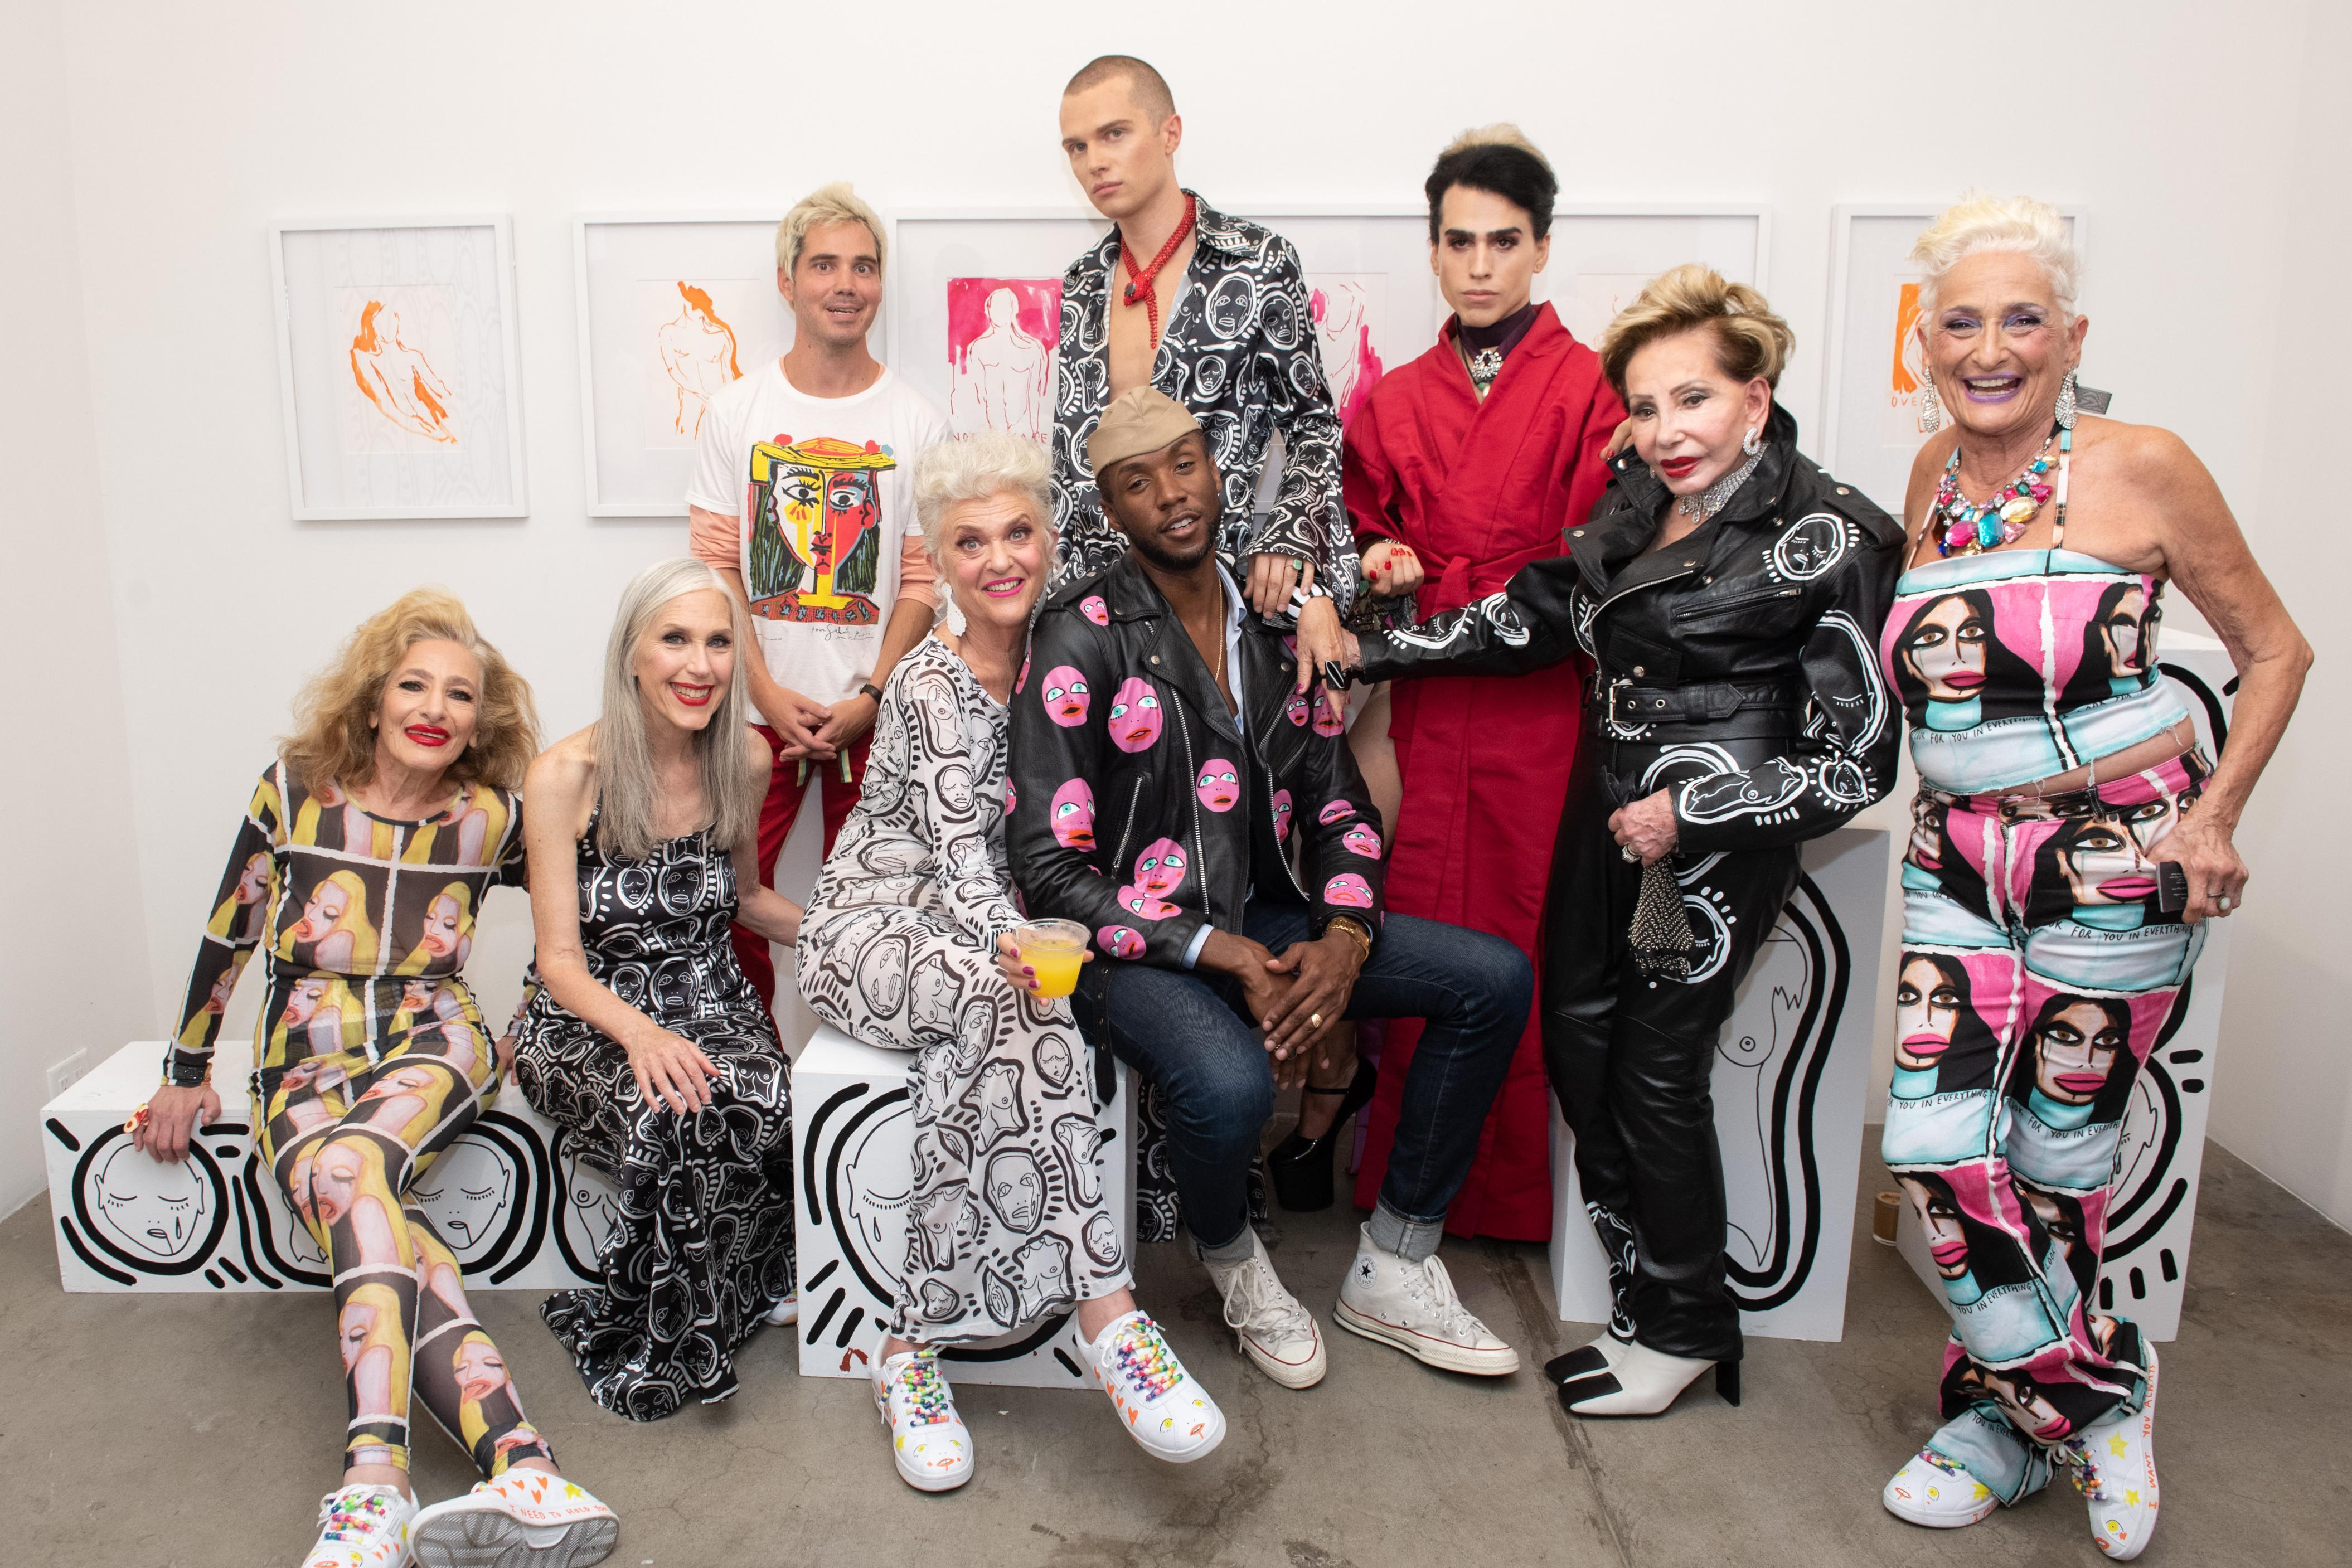 New York Fashion Week Rihanna Diversity And Drag Queens